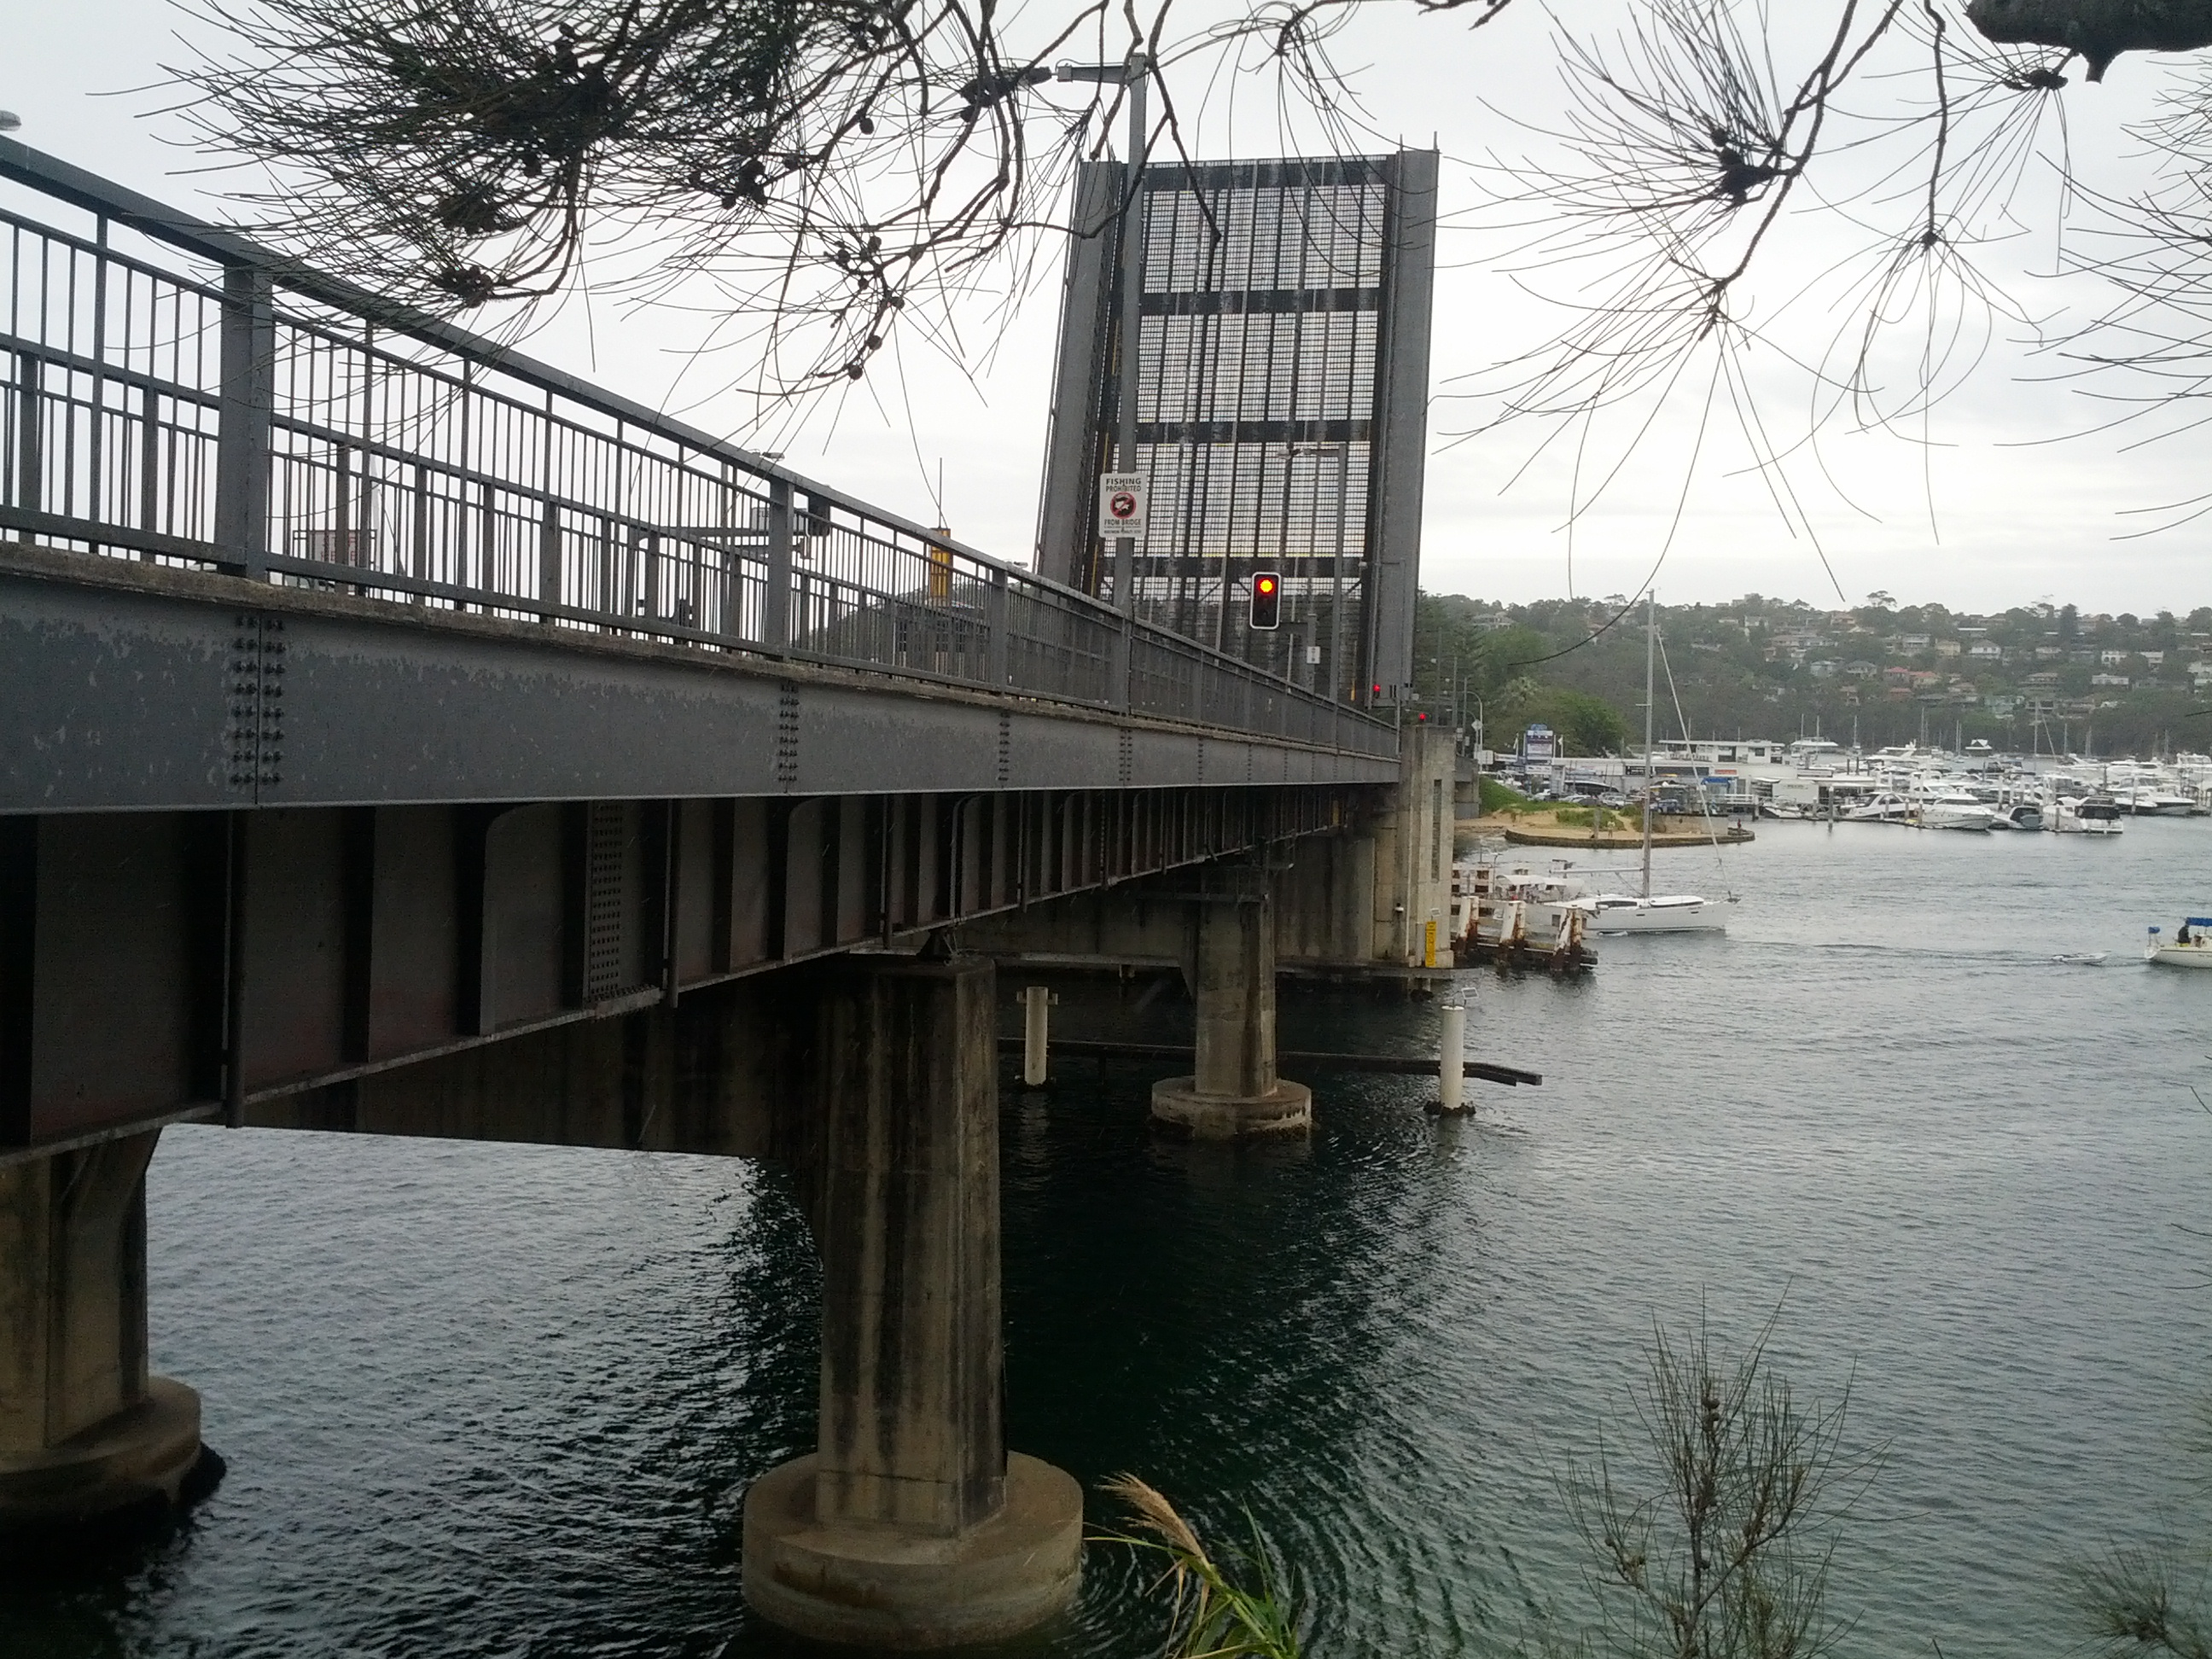 I fucking love bridges!